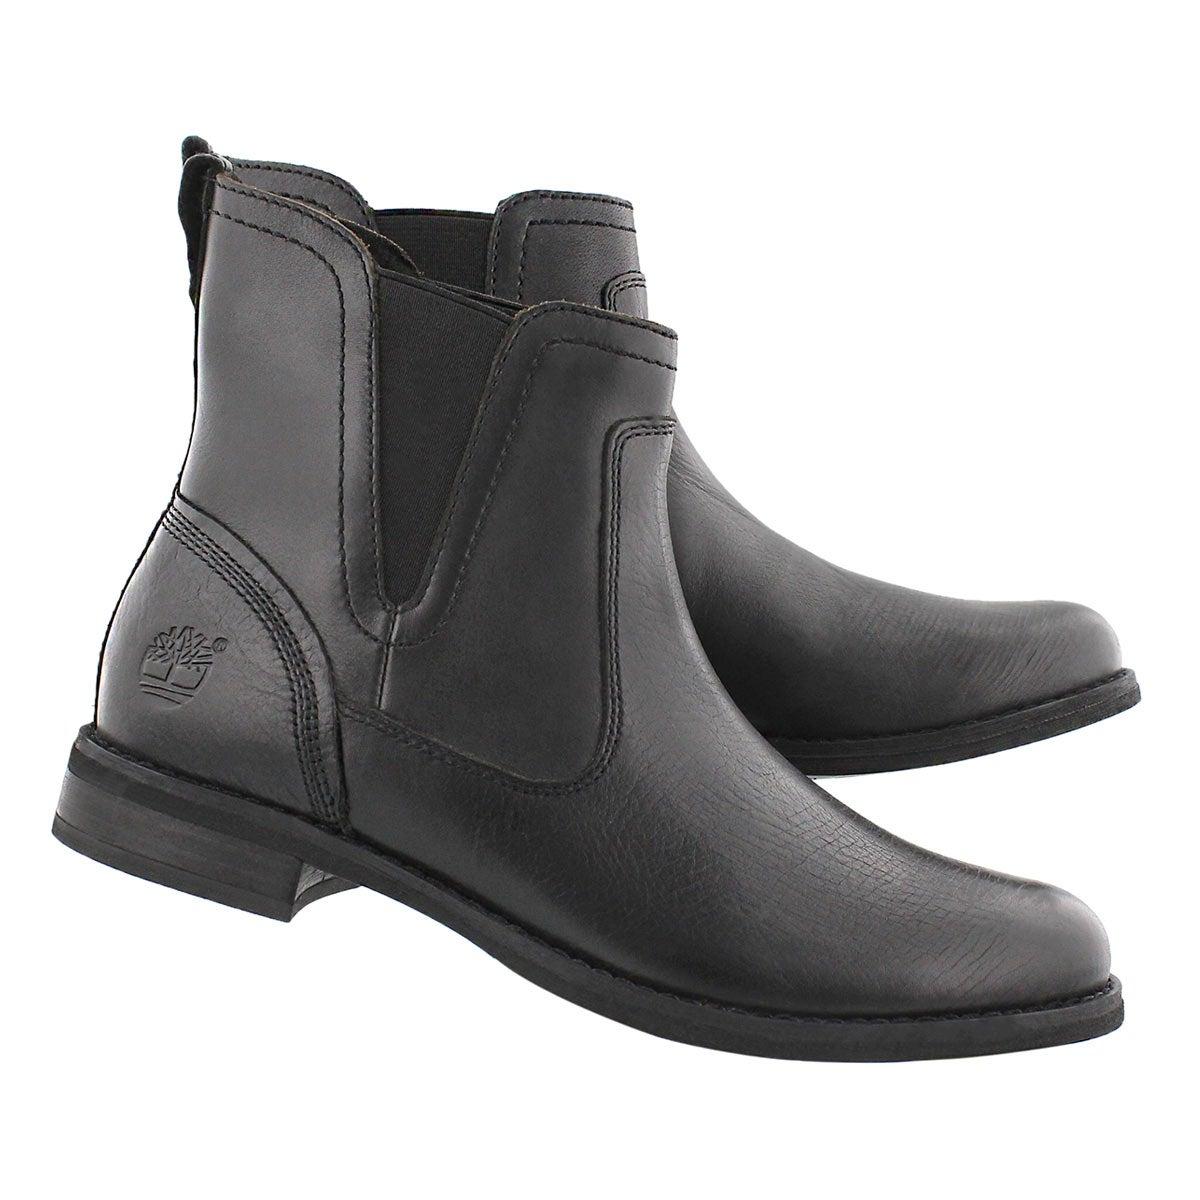 Lds Savin Hill black chelsea boot